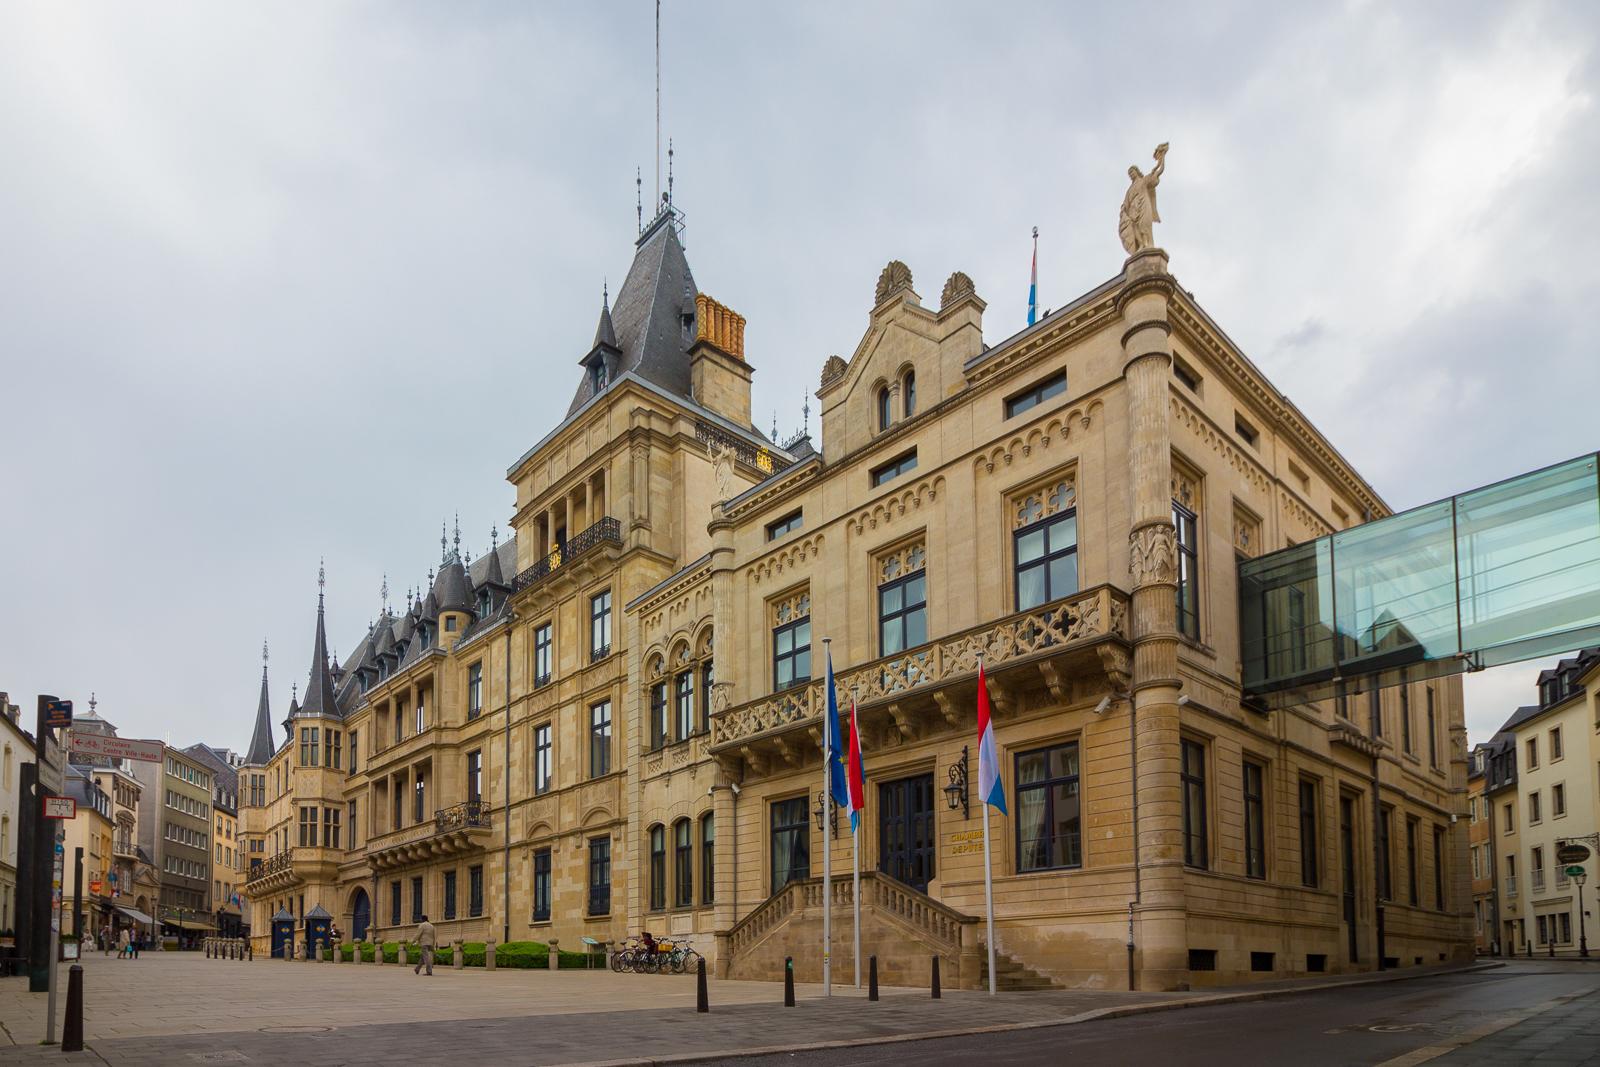 Luxemburg Zentrum, Luxemburg Stadt, Luxemburg City, Luxembourg